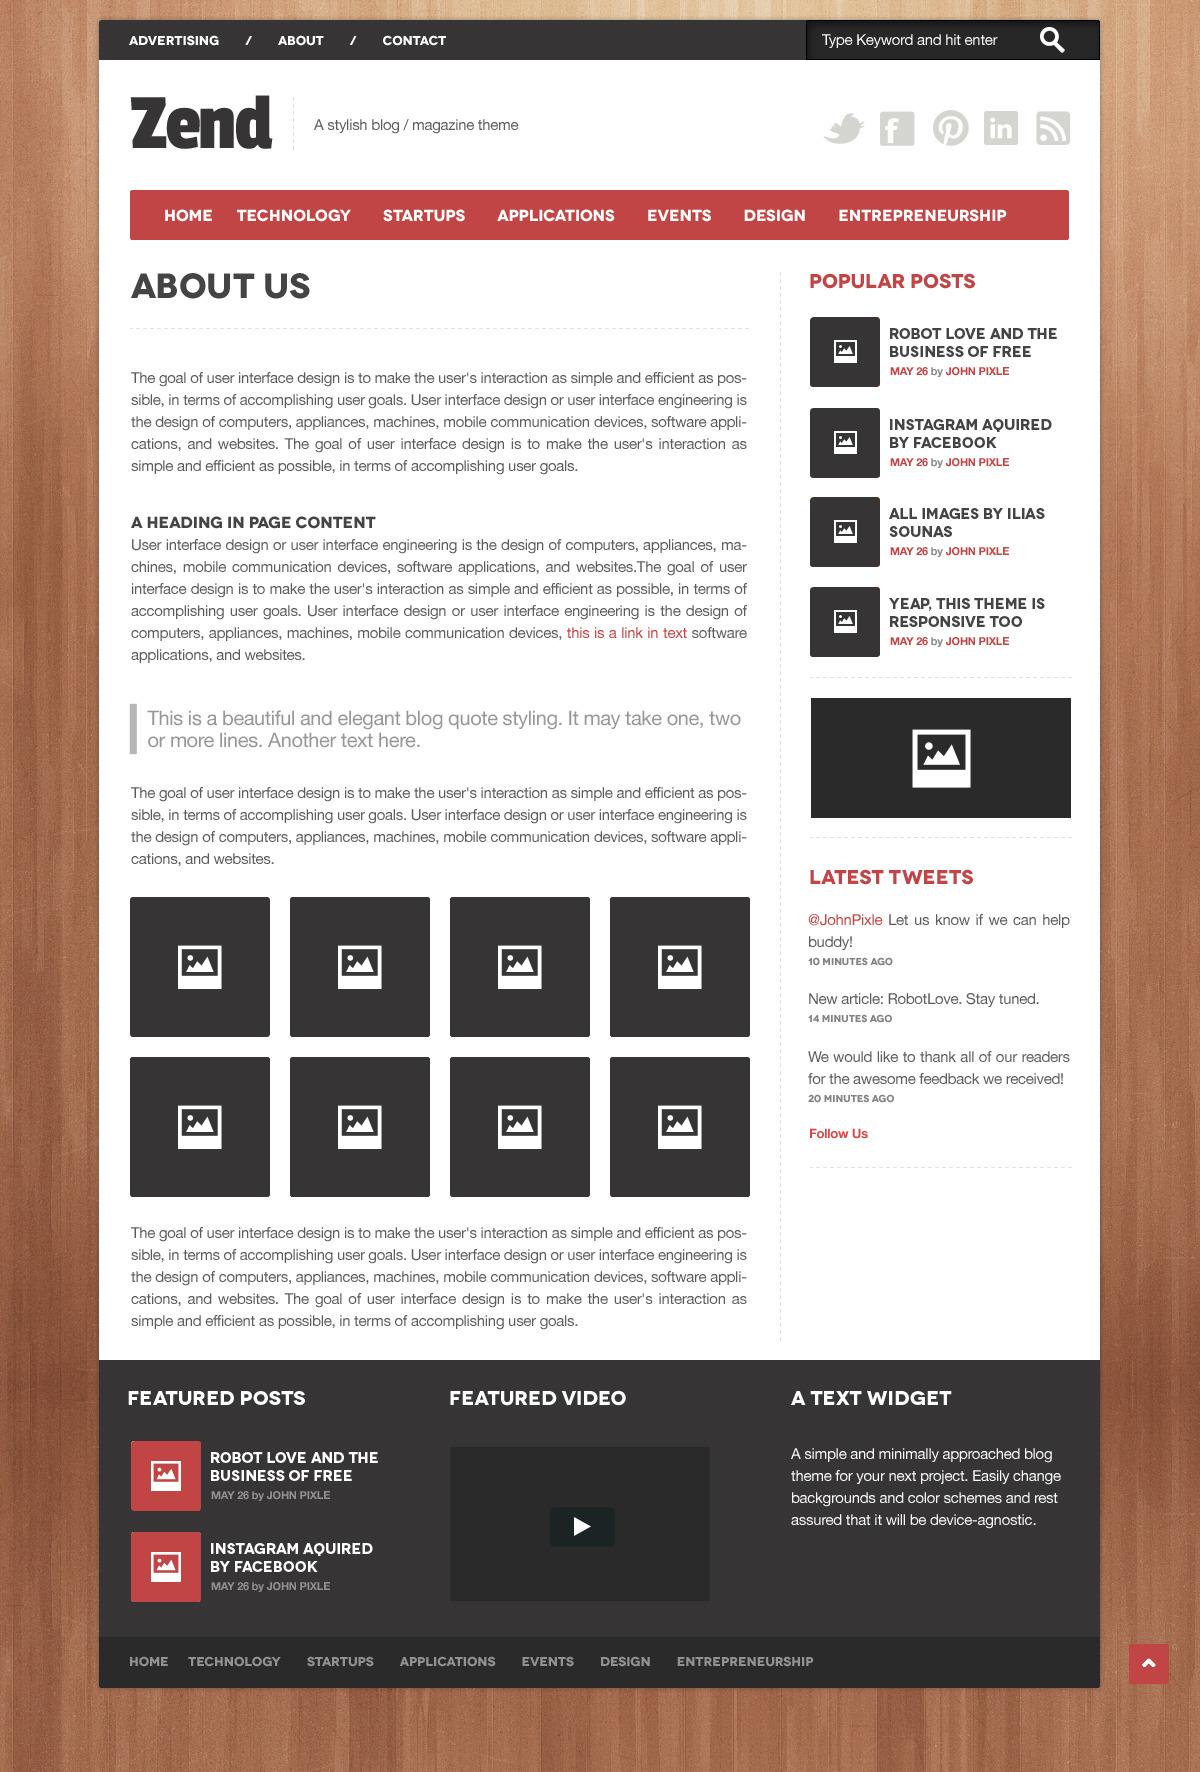 Zend - Responsive Blog/Magazine HTML template